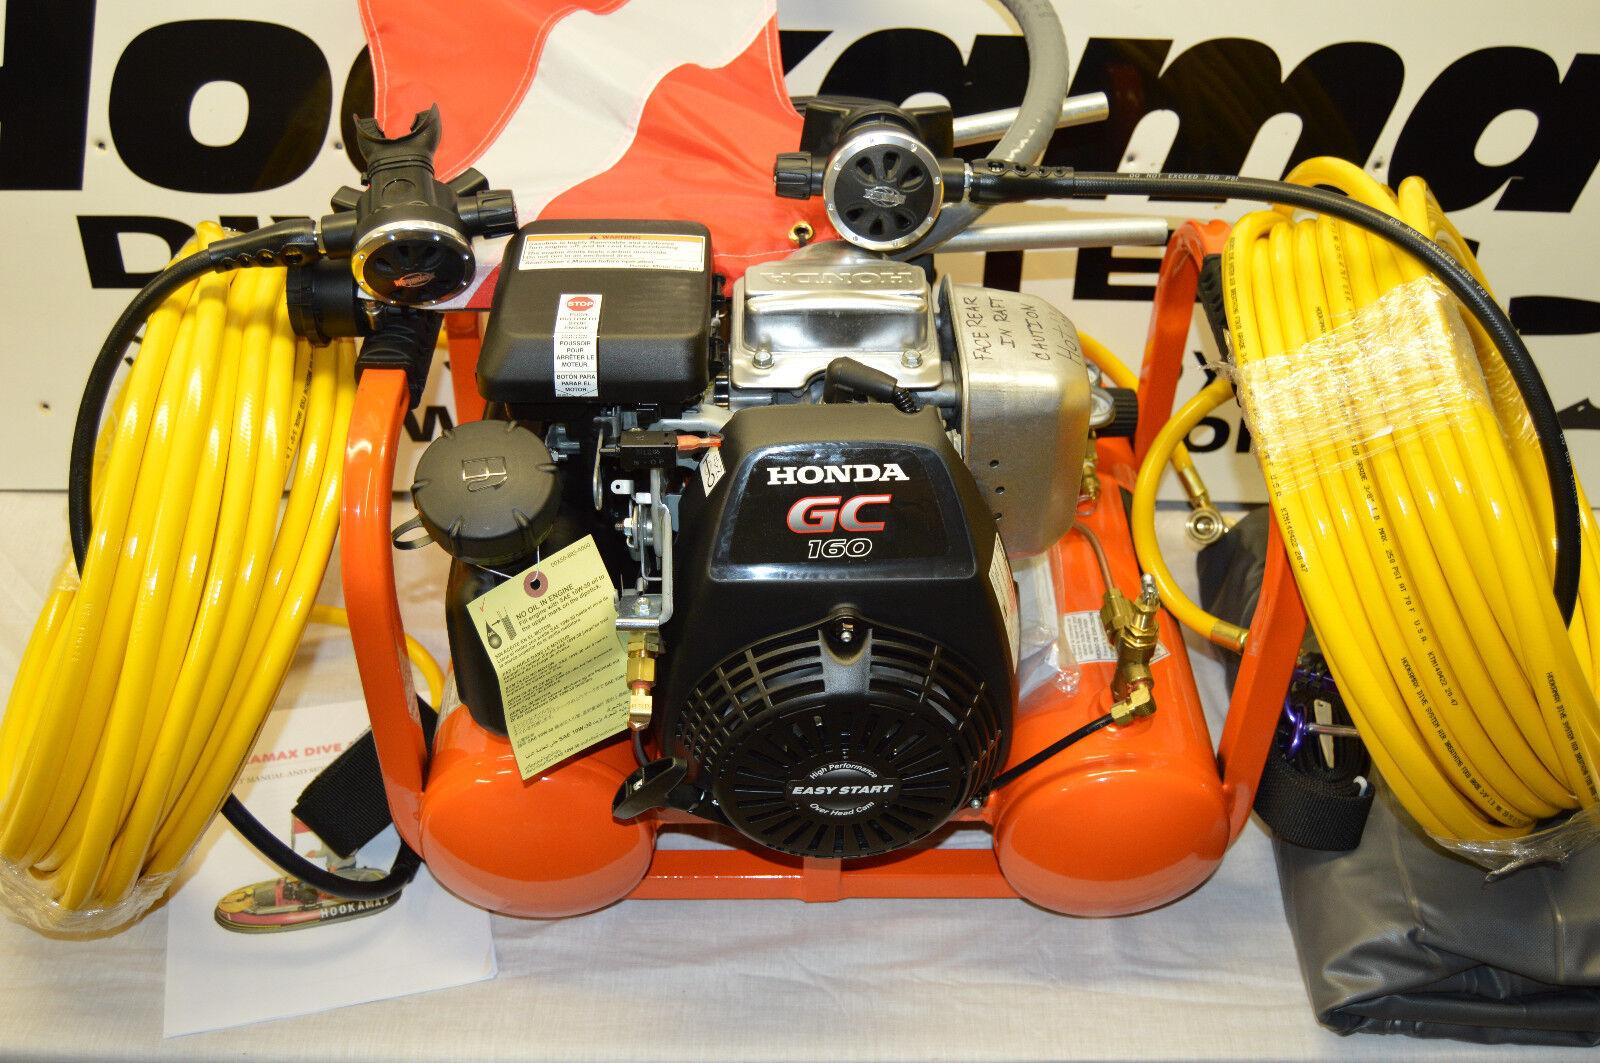 Hookamax hookah diving complete two diver gasoline petrol diving system